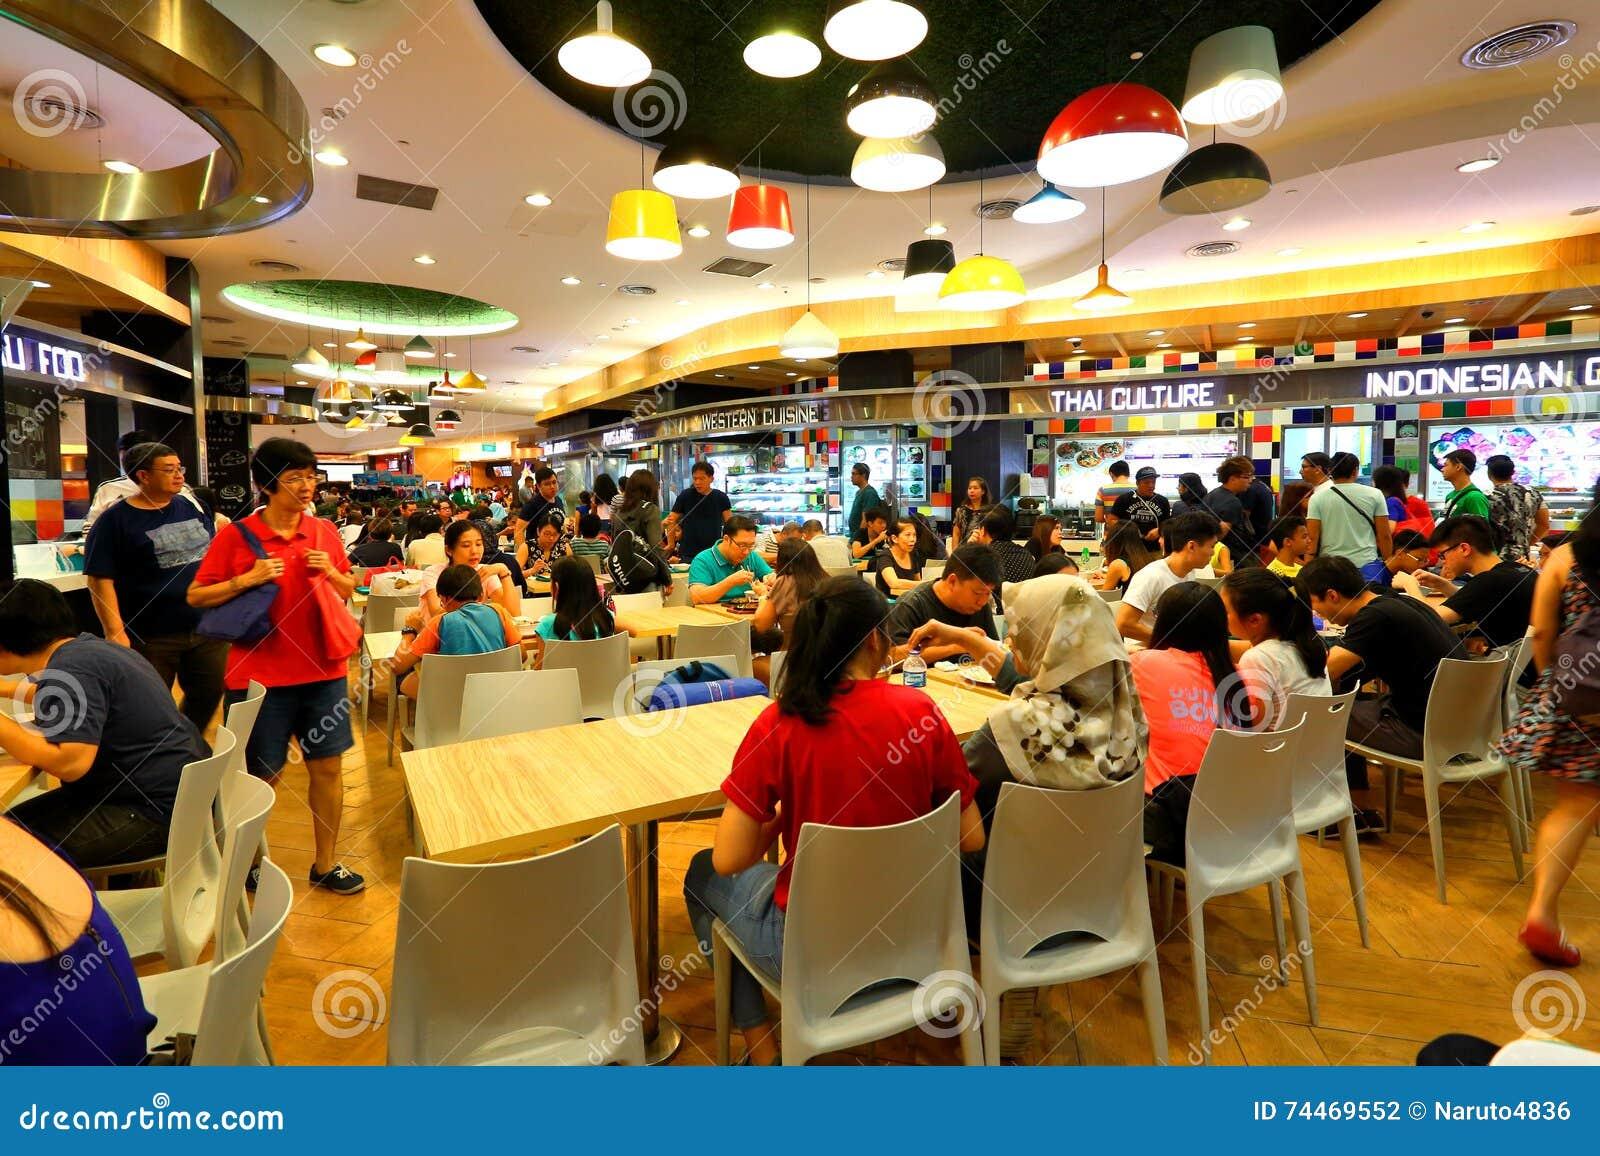 Food Court Table Malaysia